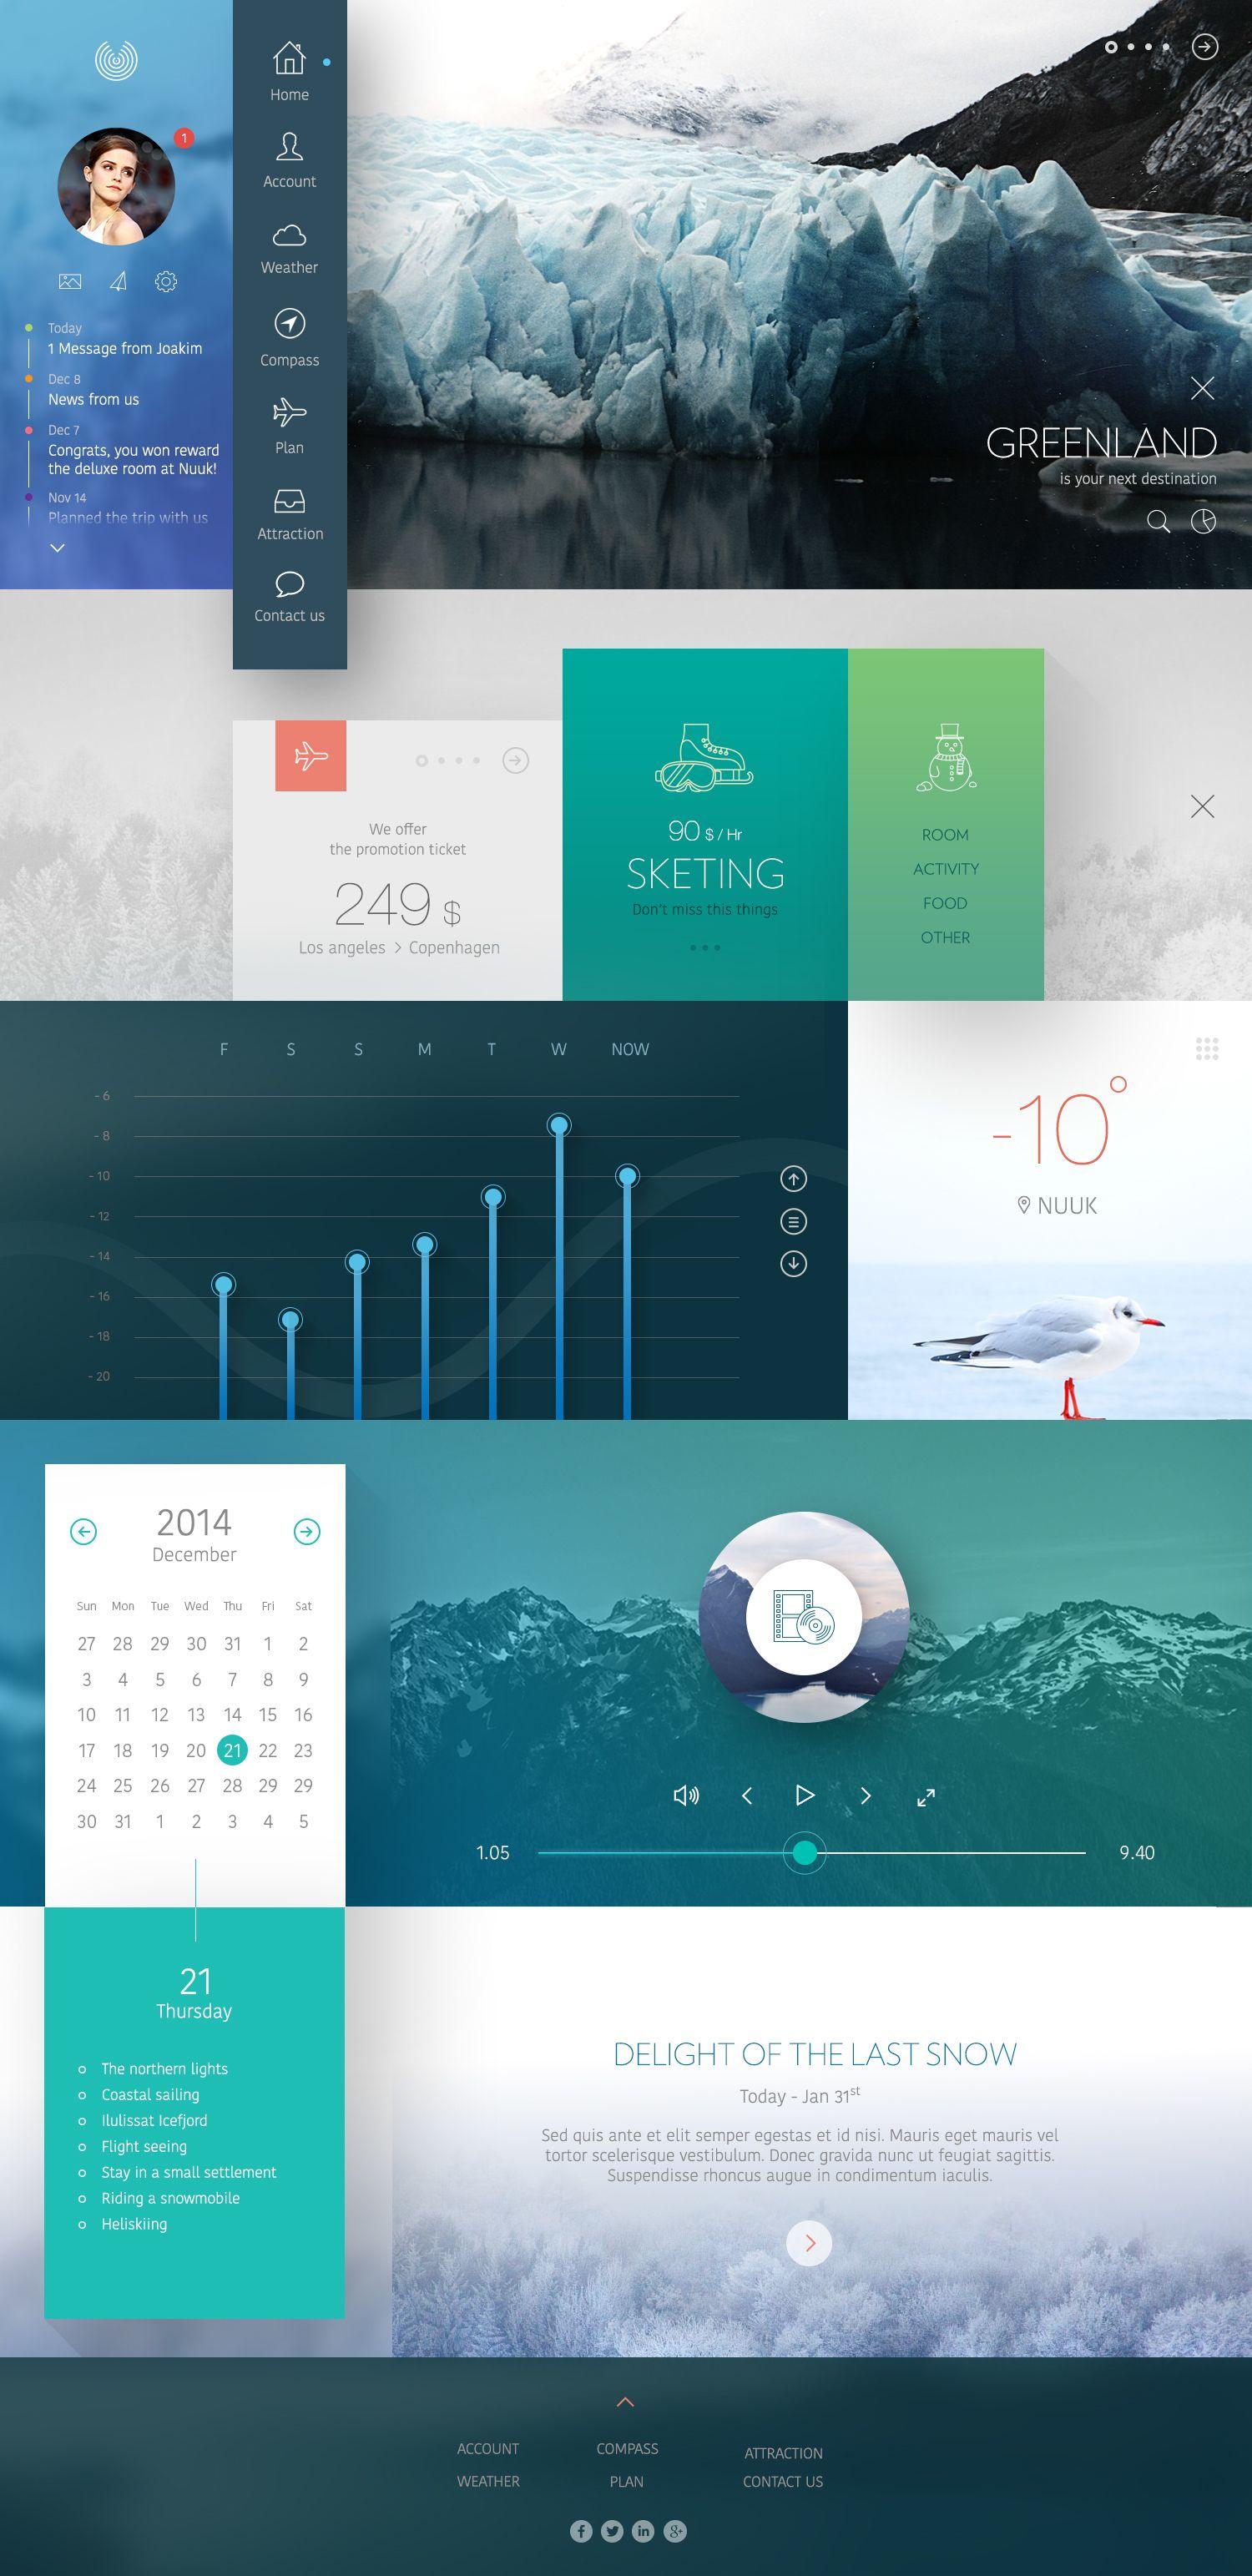 Coolest Designs Ever Coolest Website Designs Workspaces Logo S Gradient Design Website Design Dashboard Design